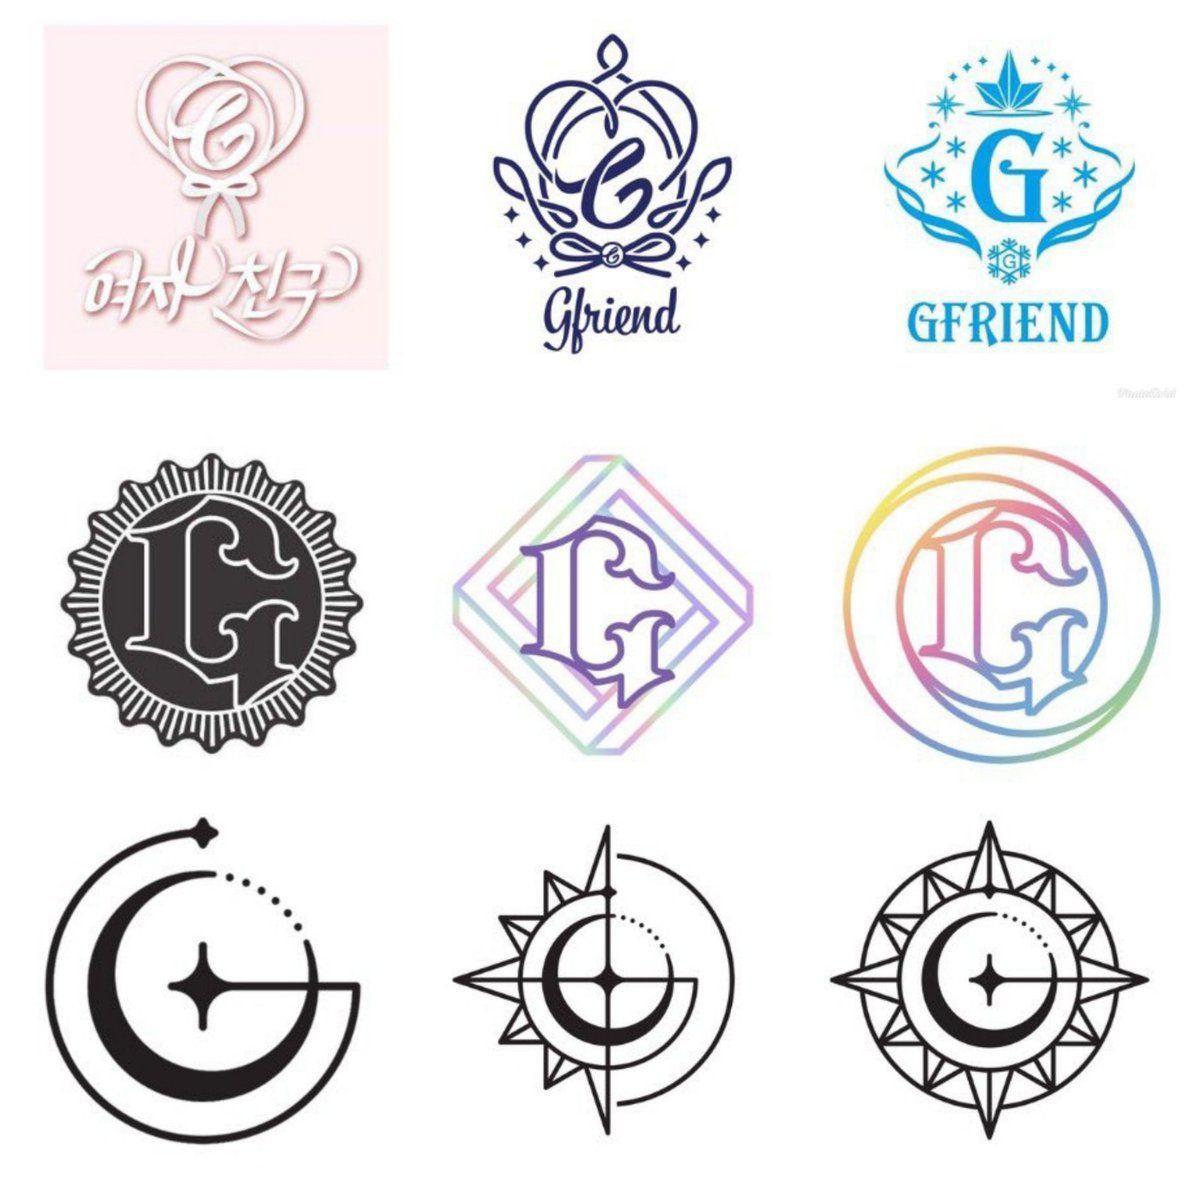 gfriend logo logodix gfriend logo logodix